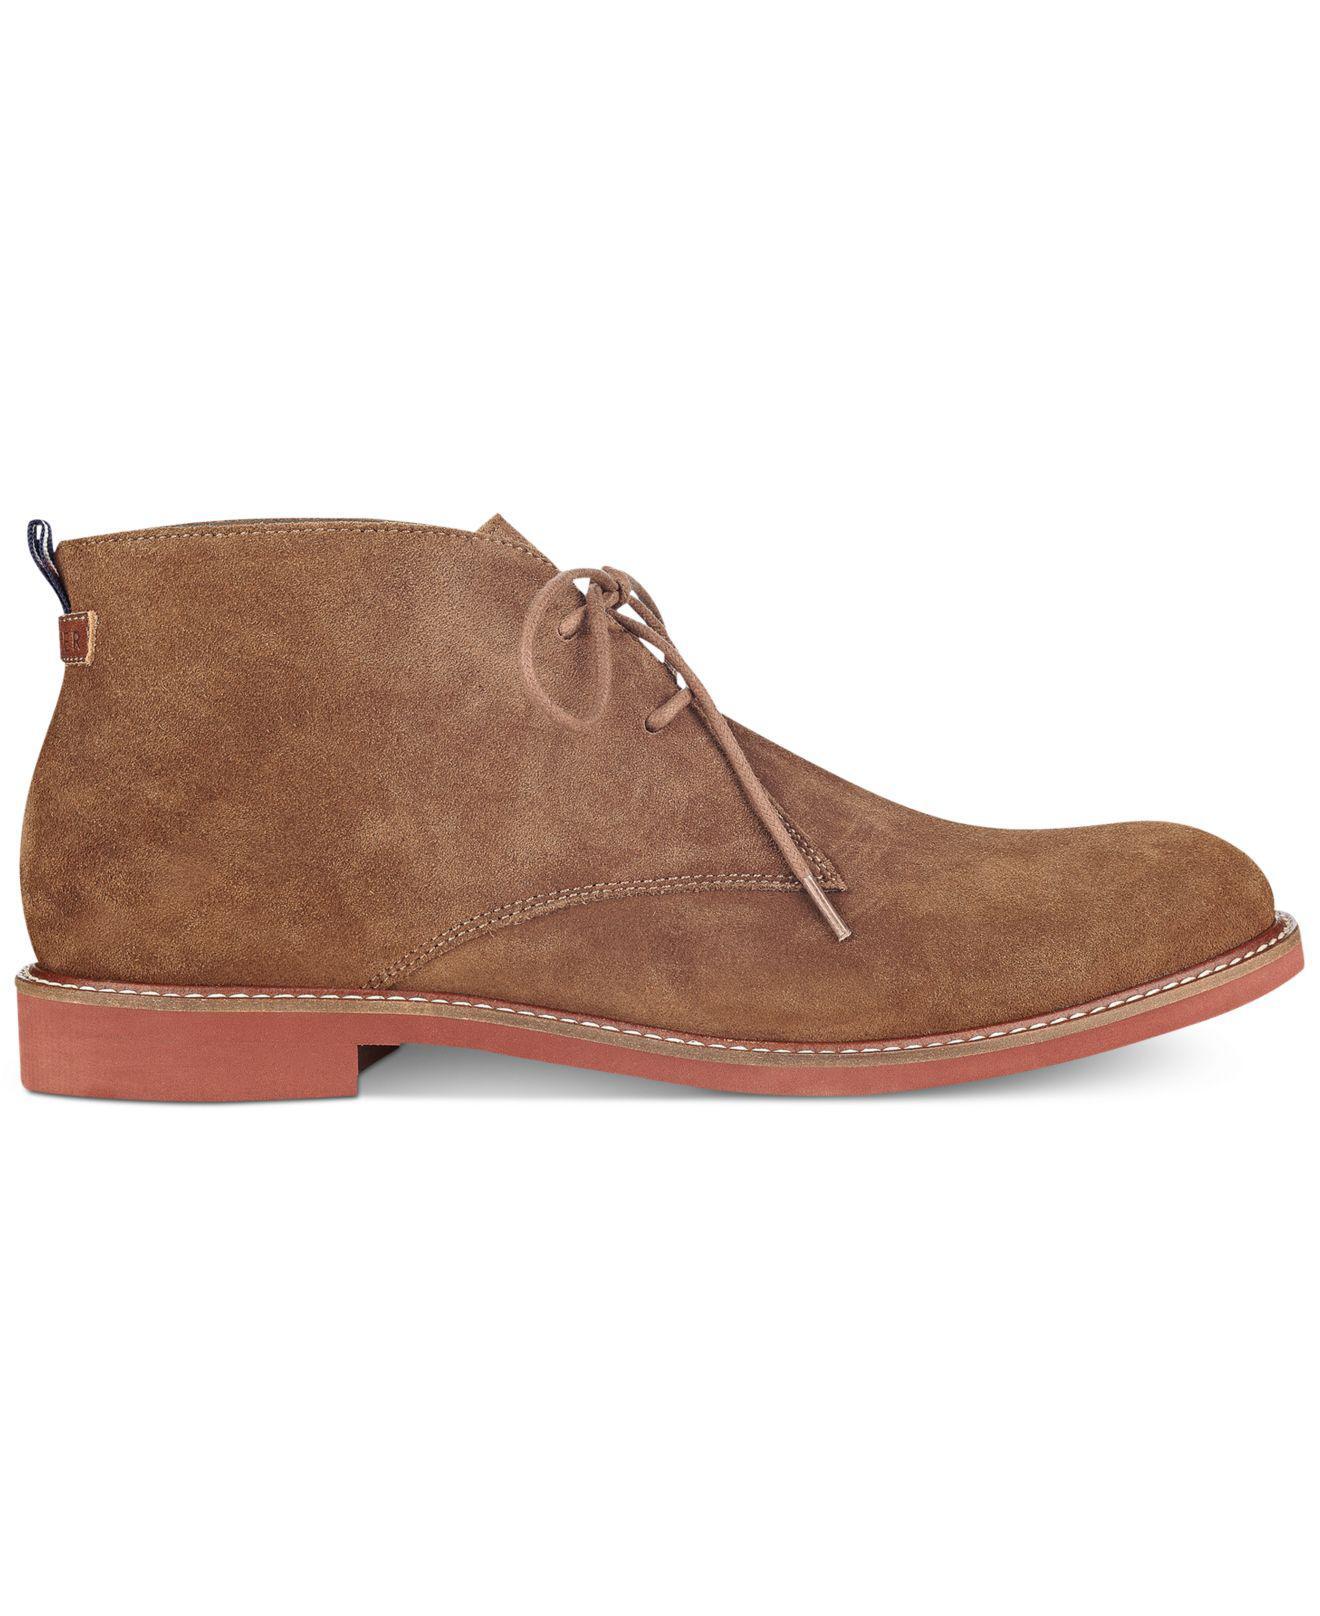 af1e68c1e Tommy Hilfiger - Brown Men s Gervis Chukka Boots for Men - Lyst. View  fullscreen